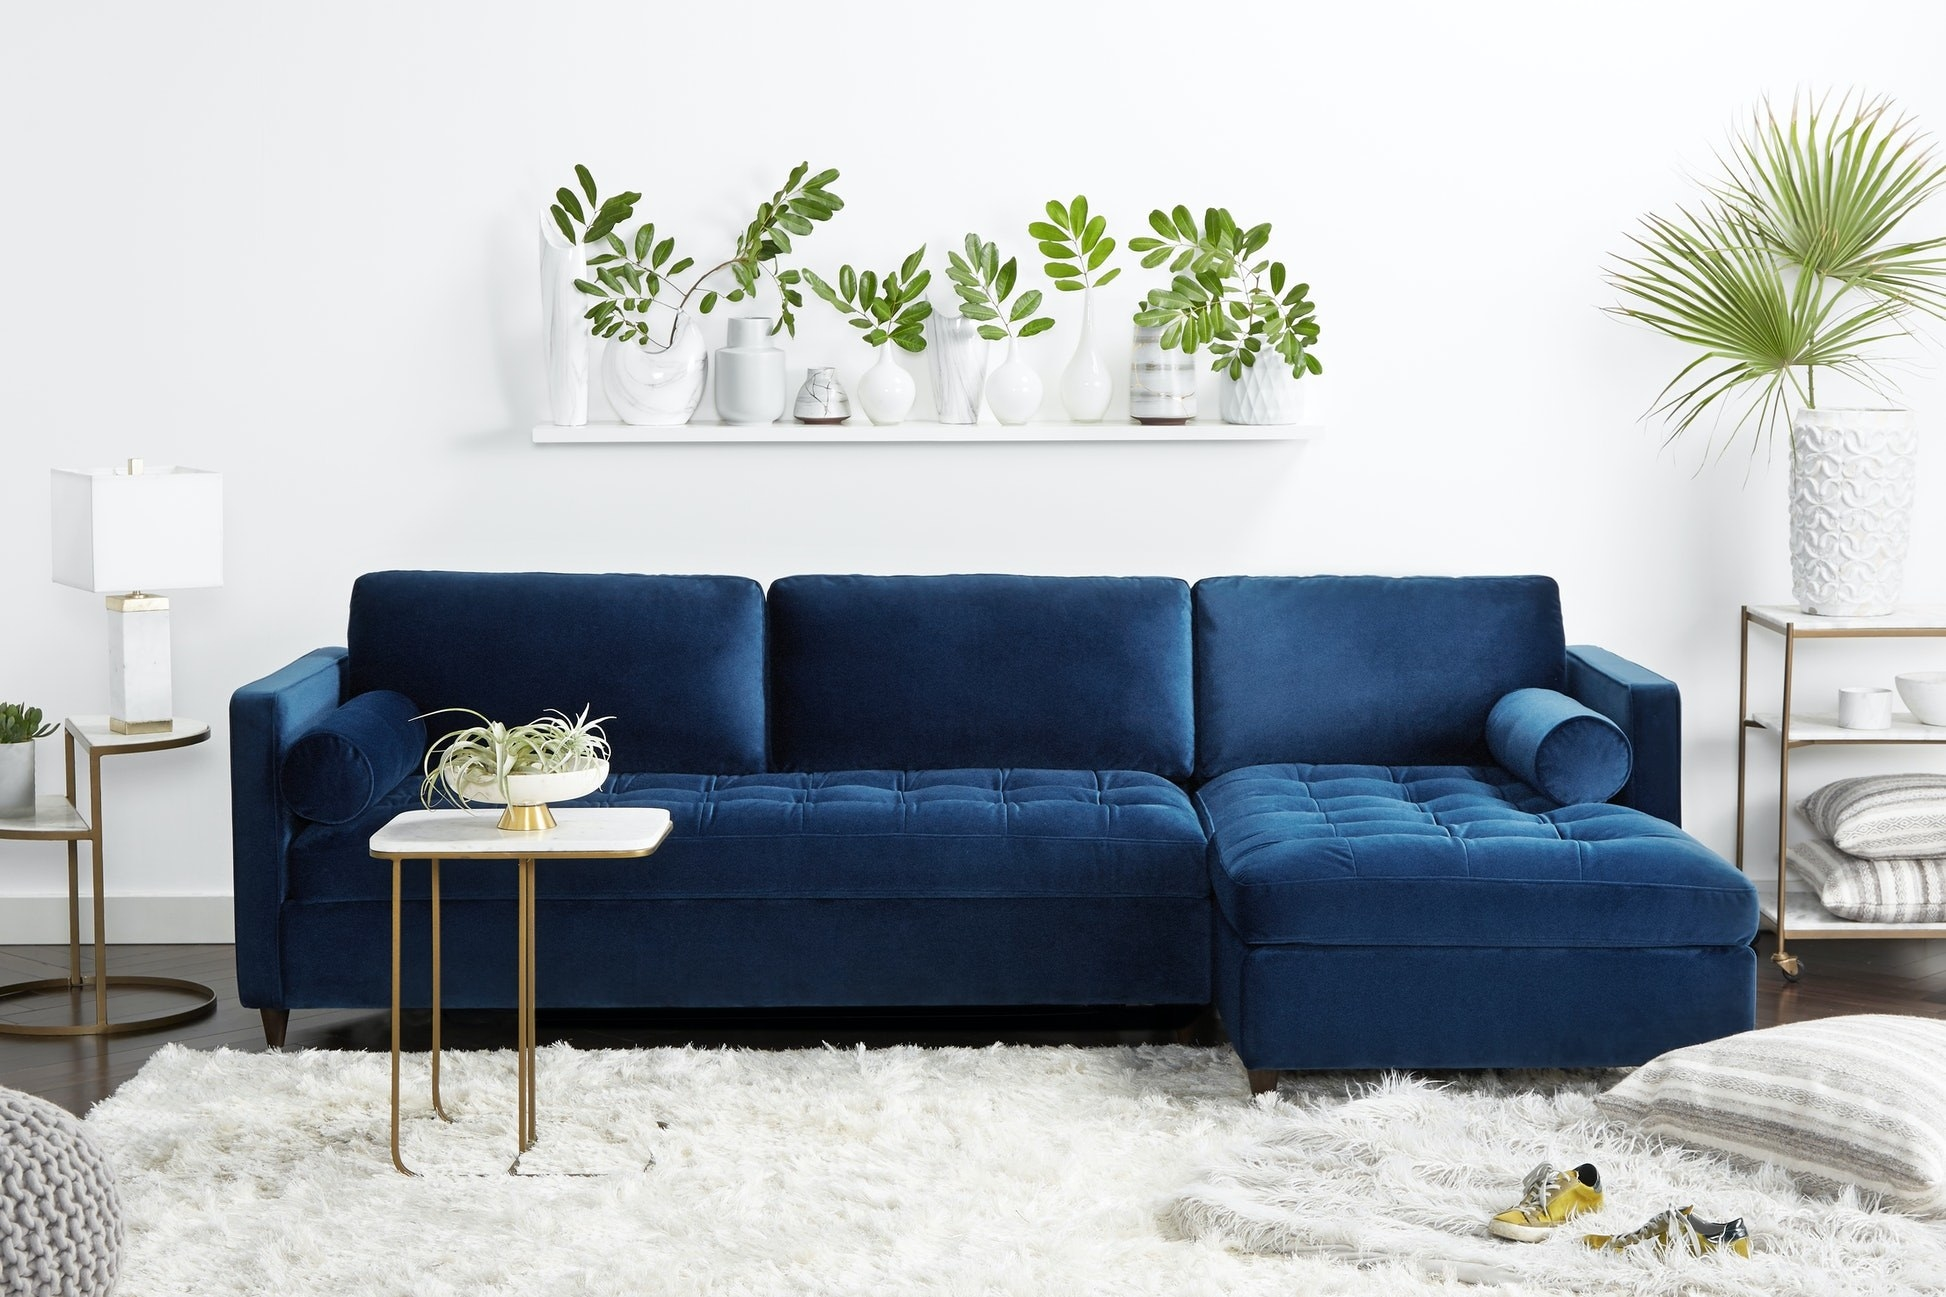 a blue velvet sofa with a chaise